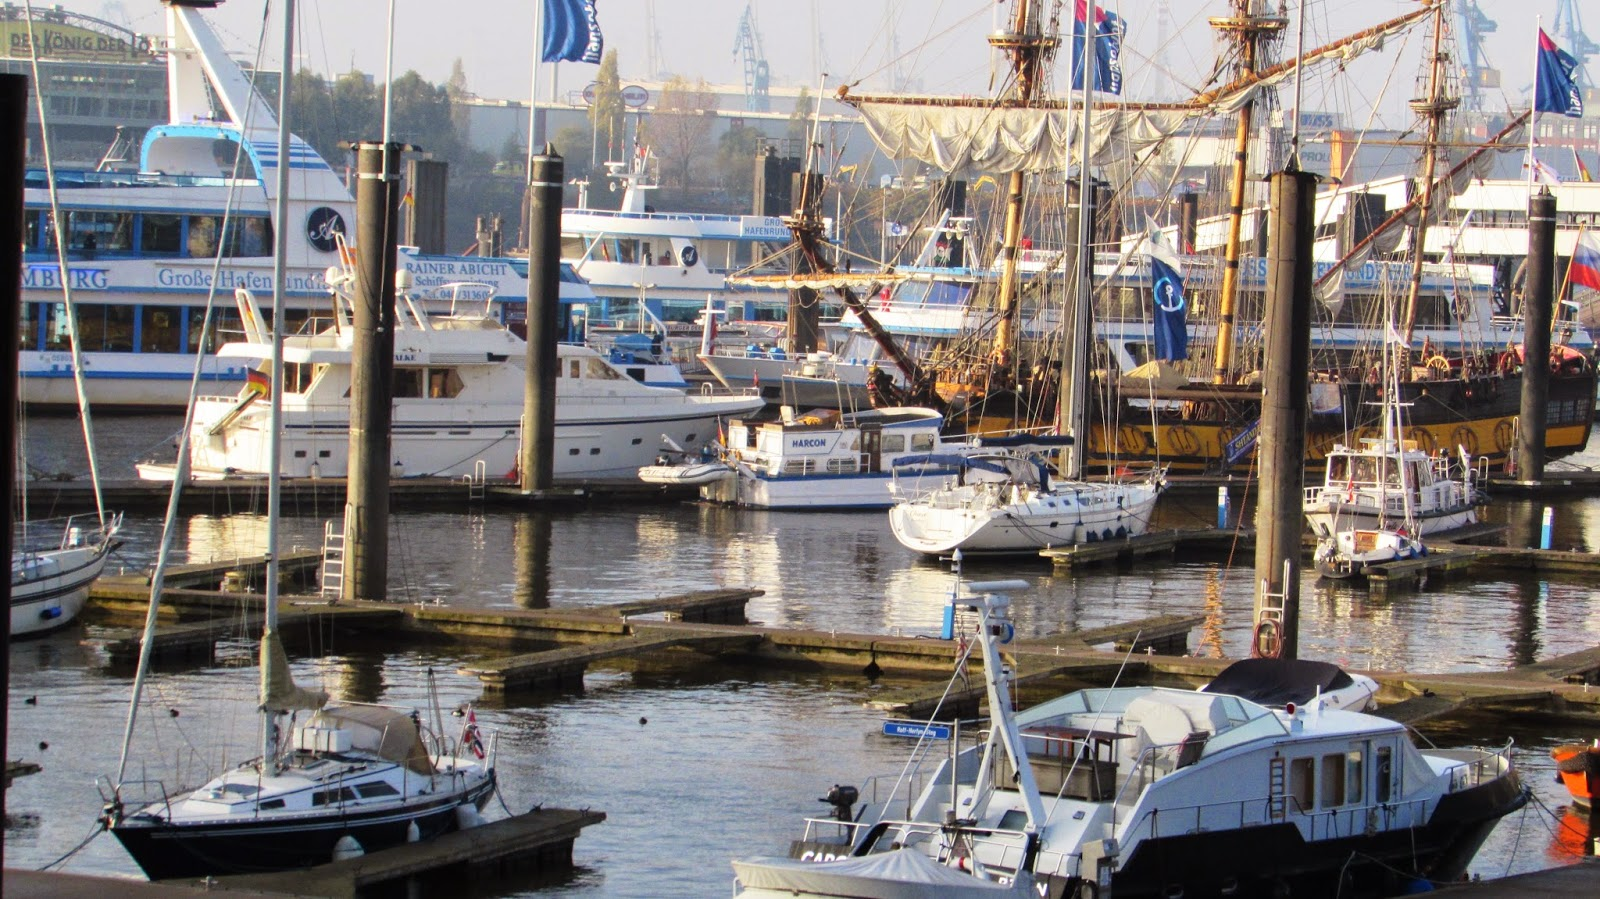 statki, woda, port